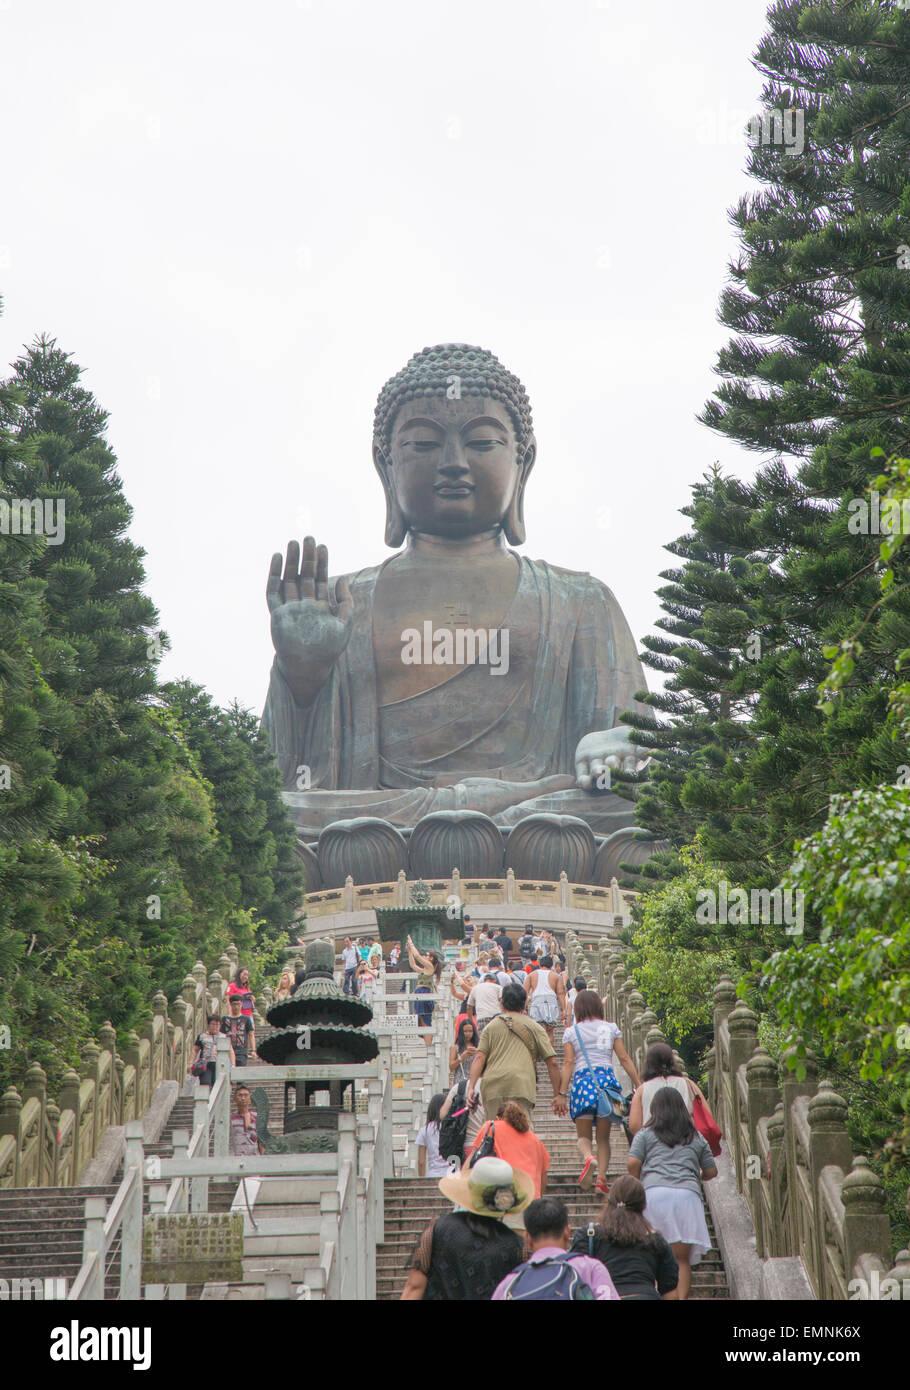 A Buddha statue on the Lantau island in Hong Kong. - Stock Image